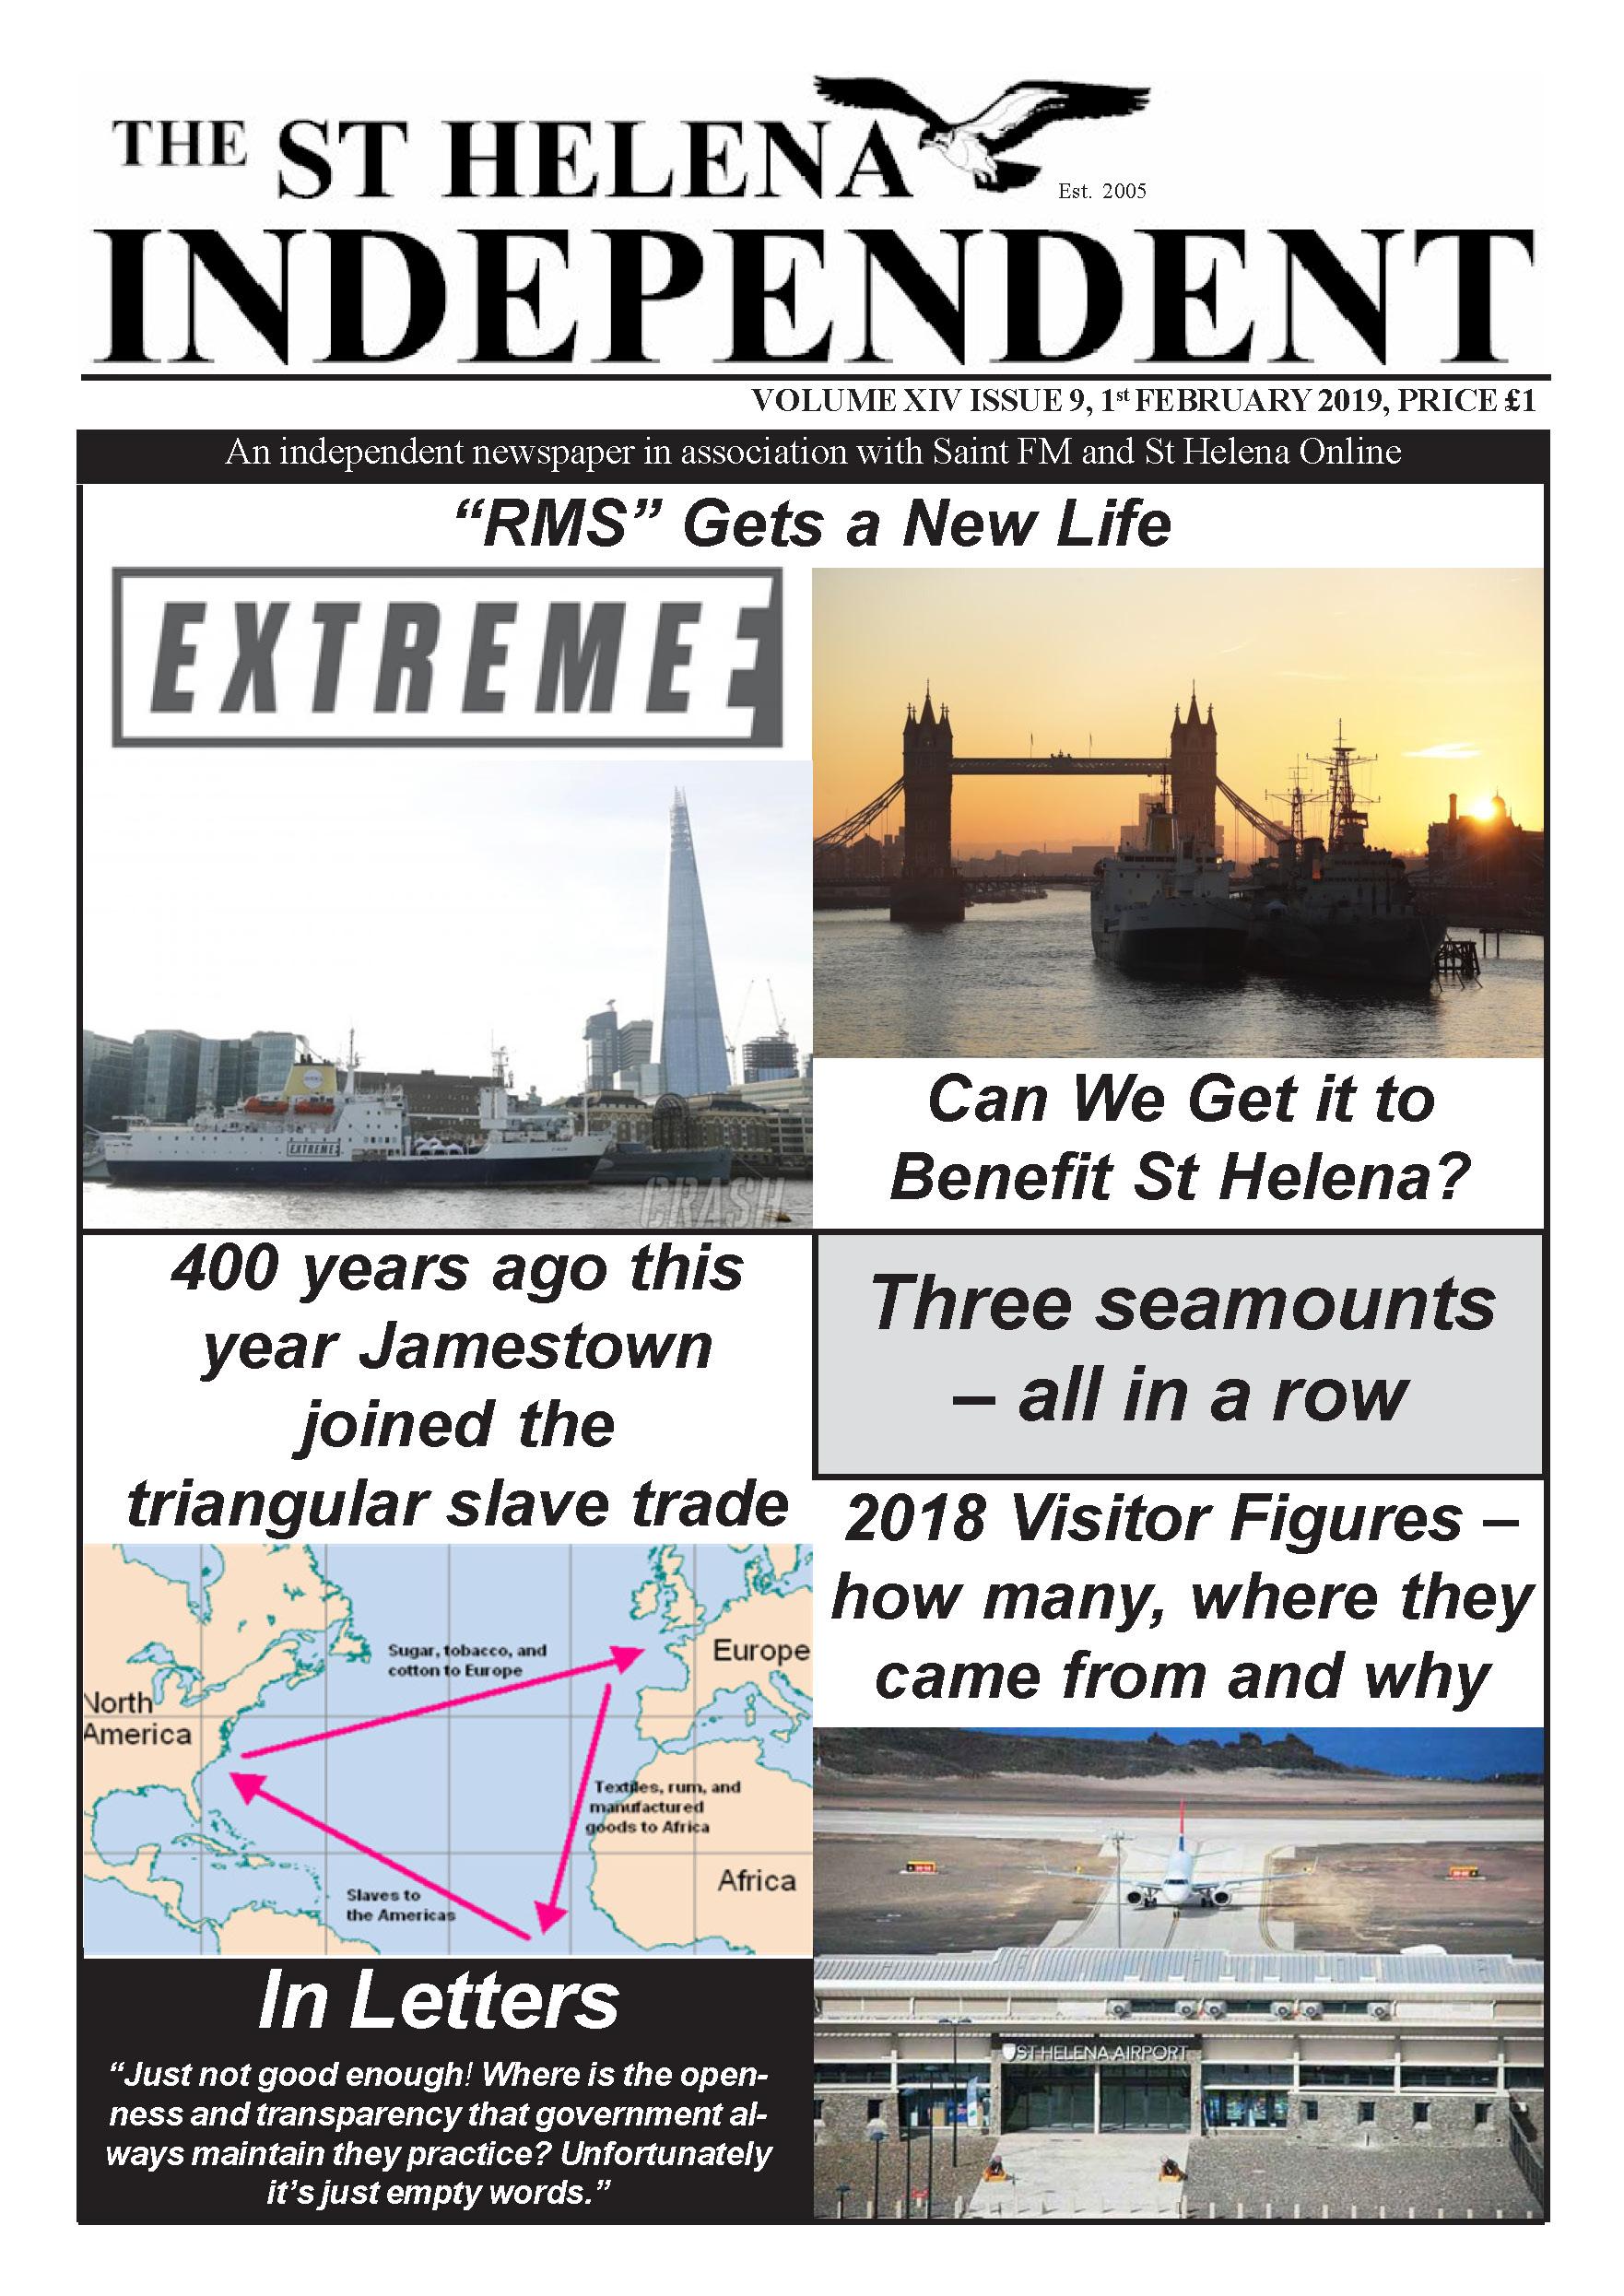 St Helena Independent 20190201